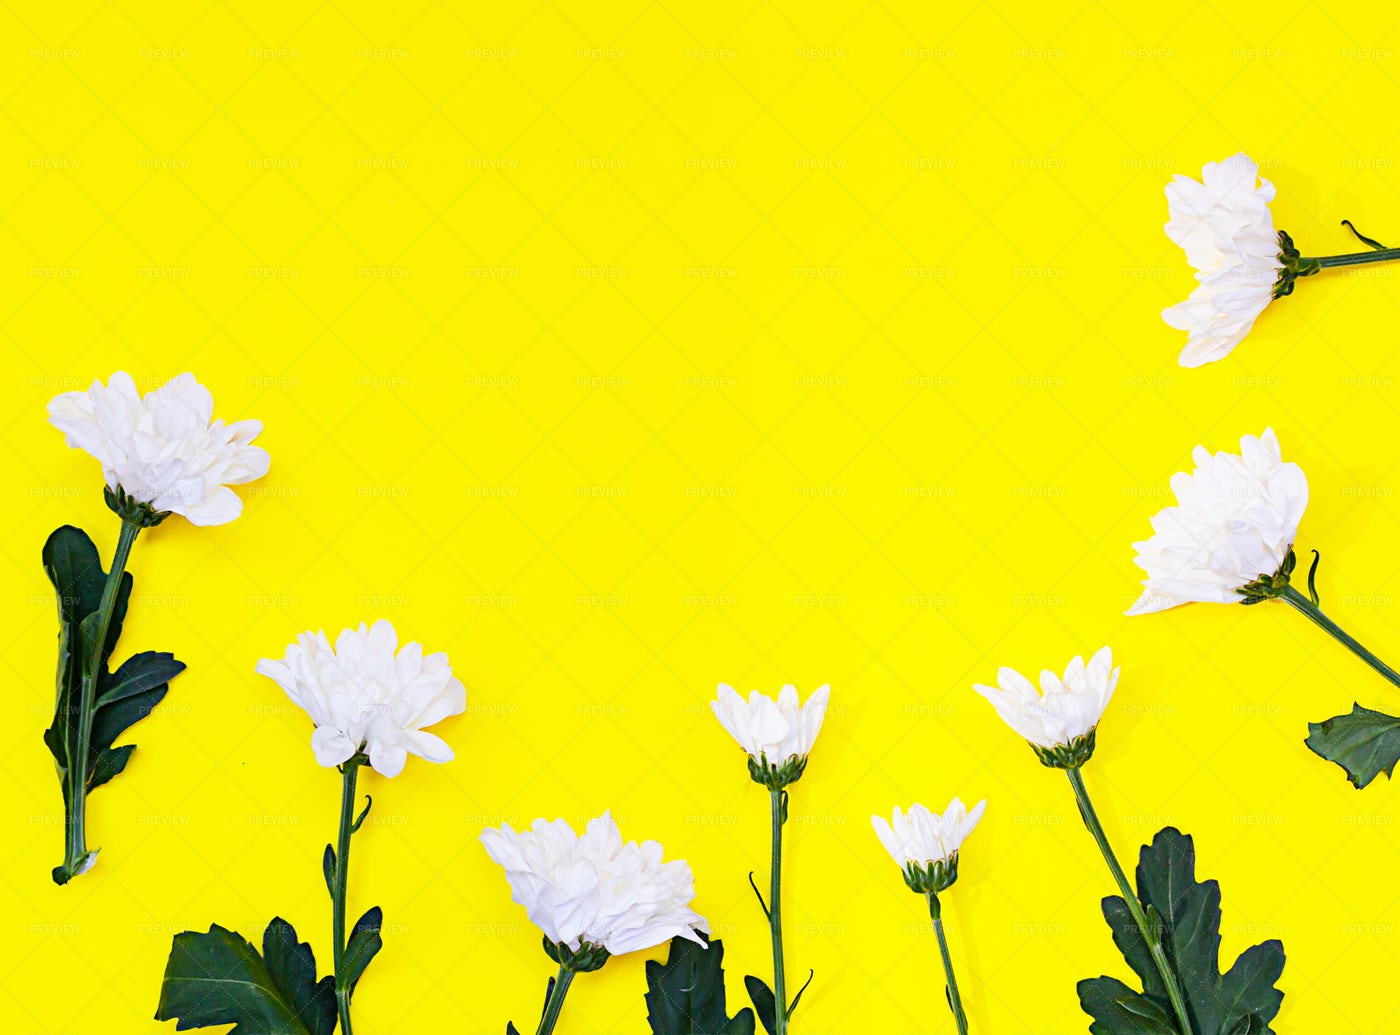 White Chrysanthemums Background: Stock Photos